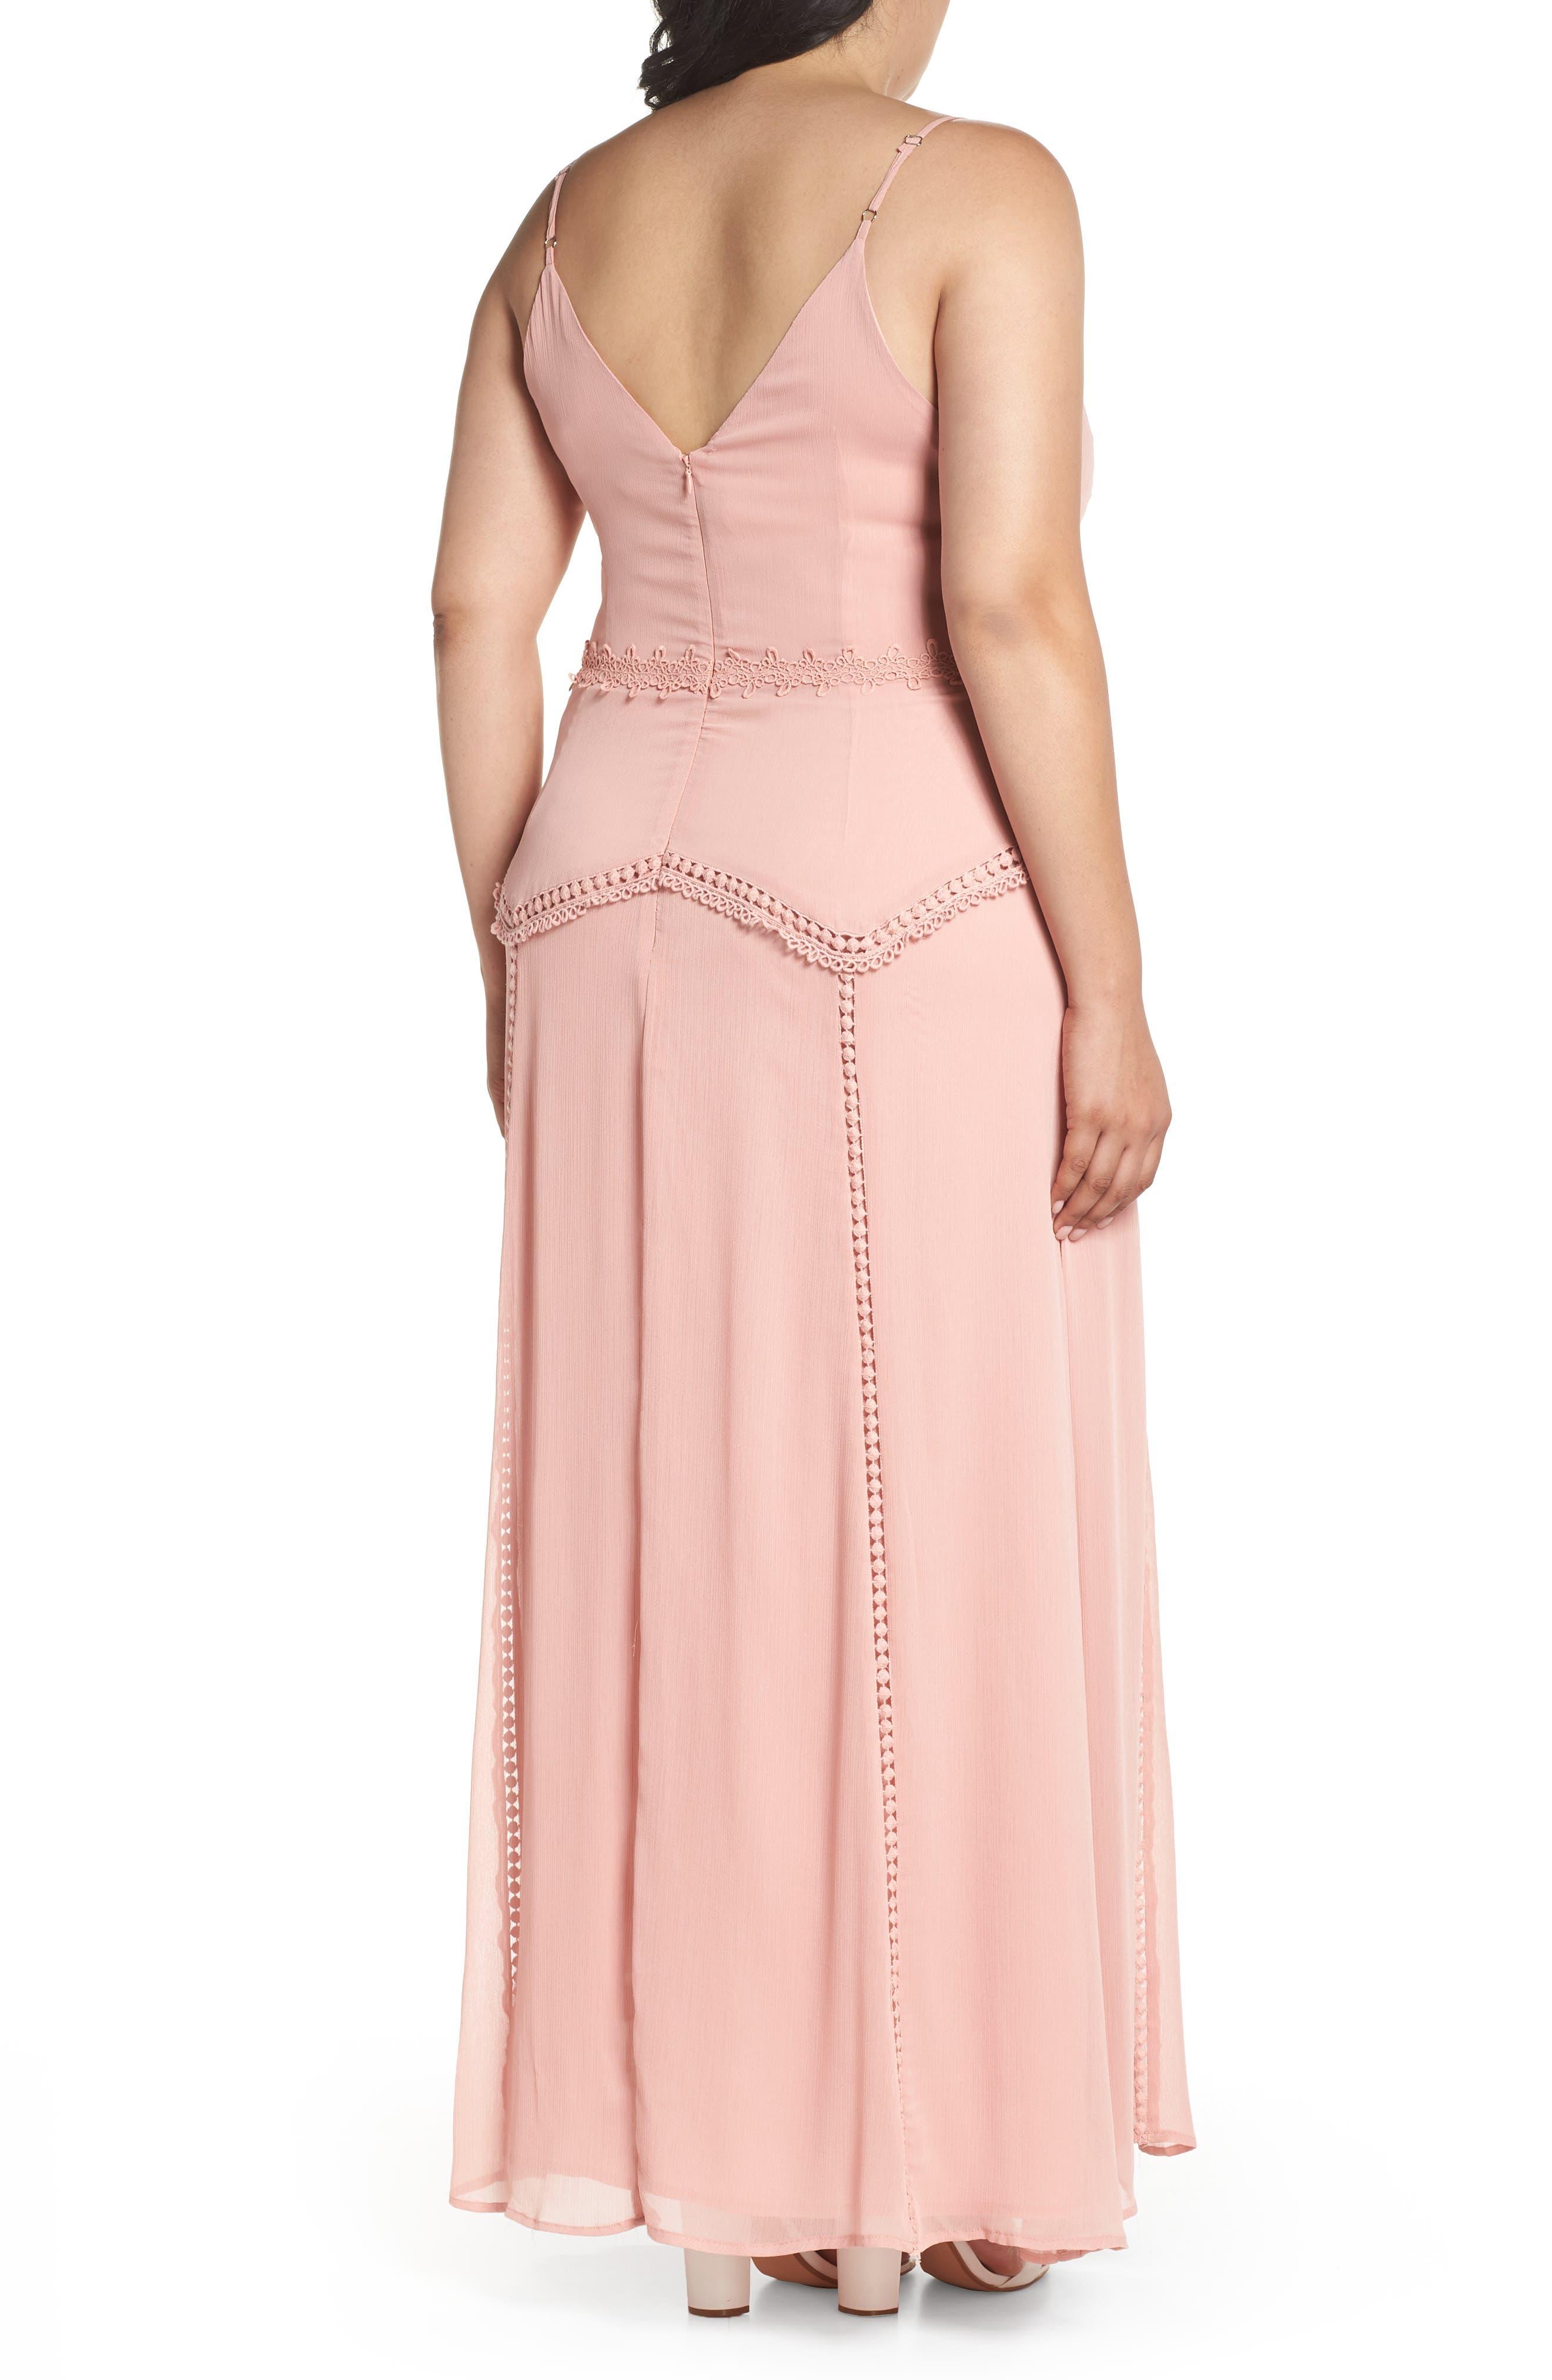 Picot Trim Maxi Dress,                             Alternate thumbnail 2, color,                             650